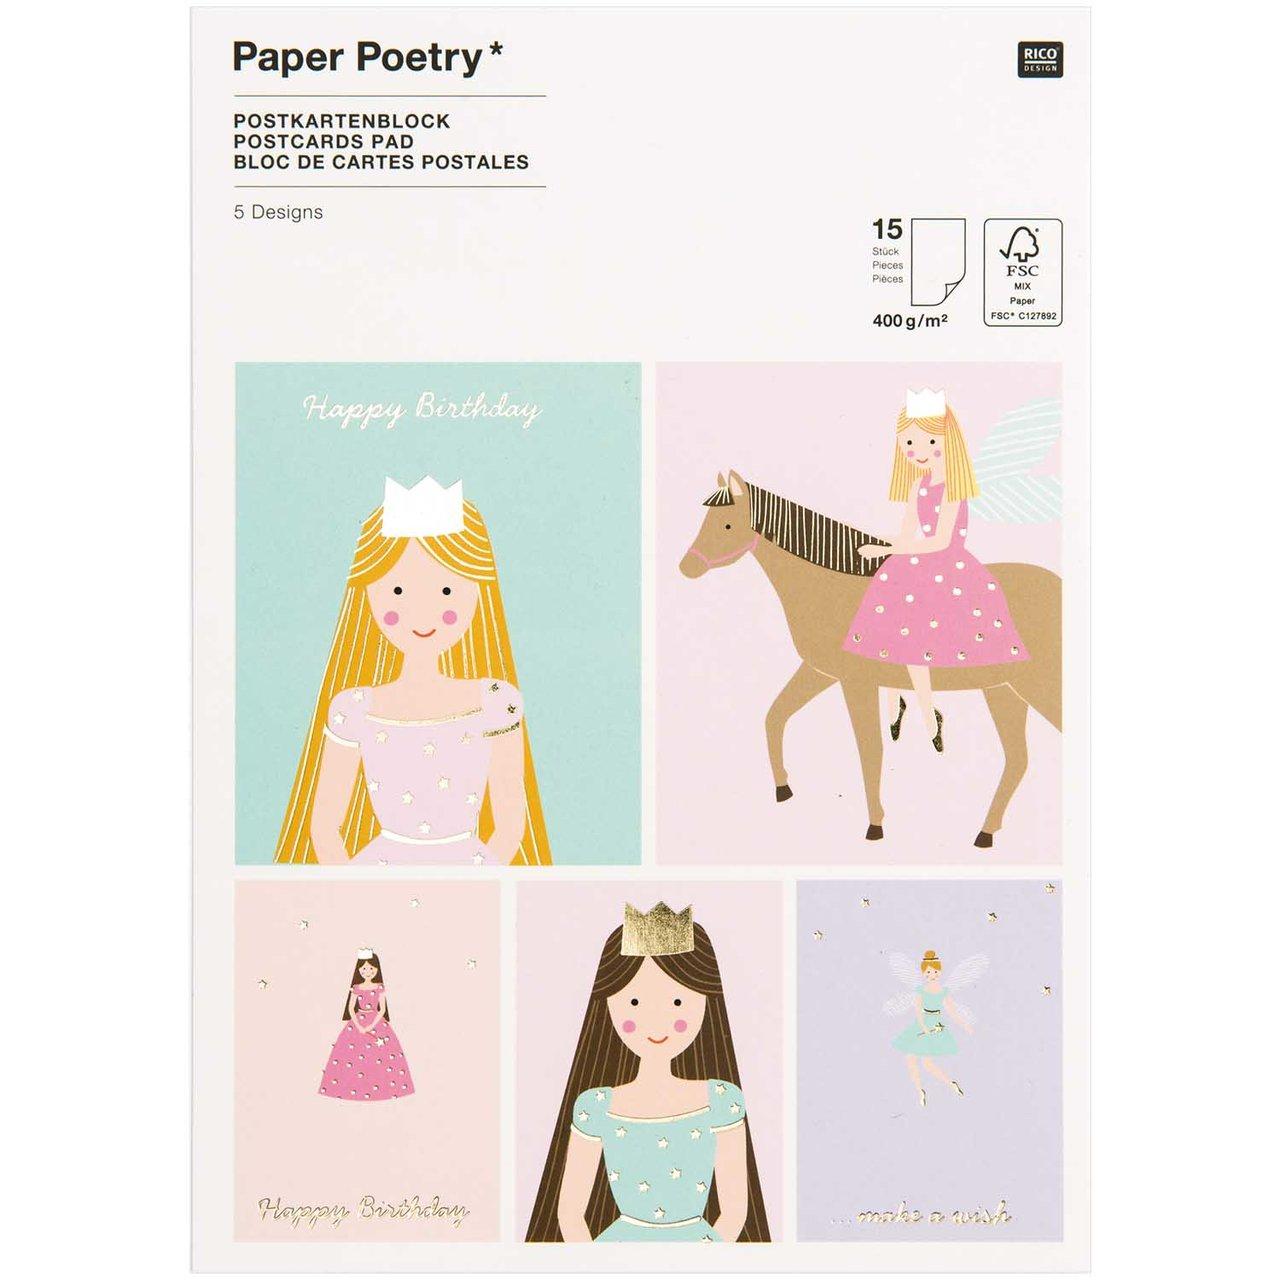 Paper Poetry Postkartenblock Prinzessin 400g/m²...